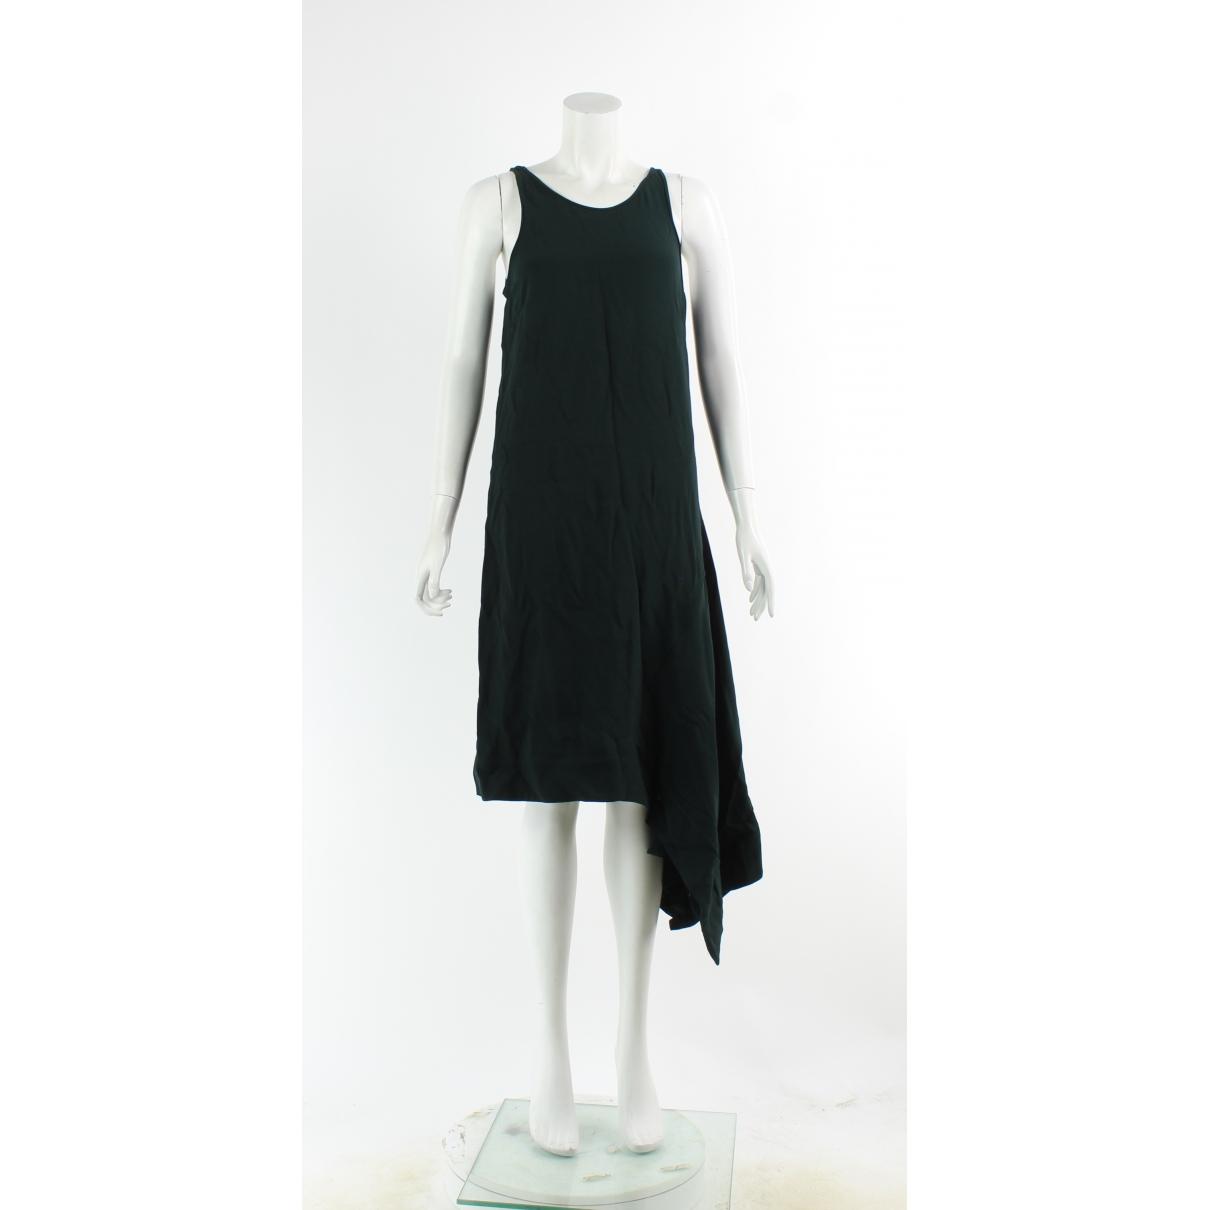 Marni \N Green dress for Women 40 FR